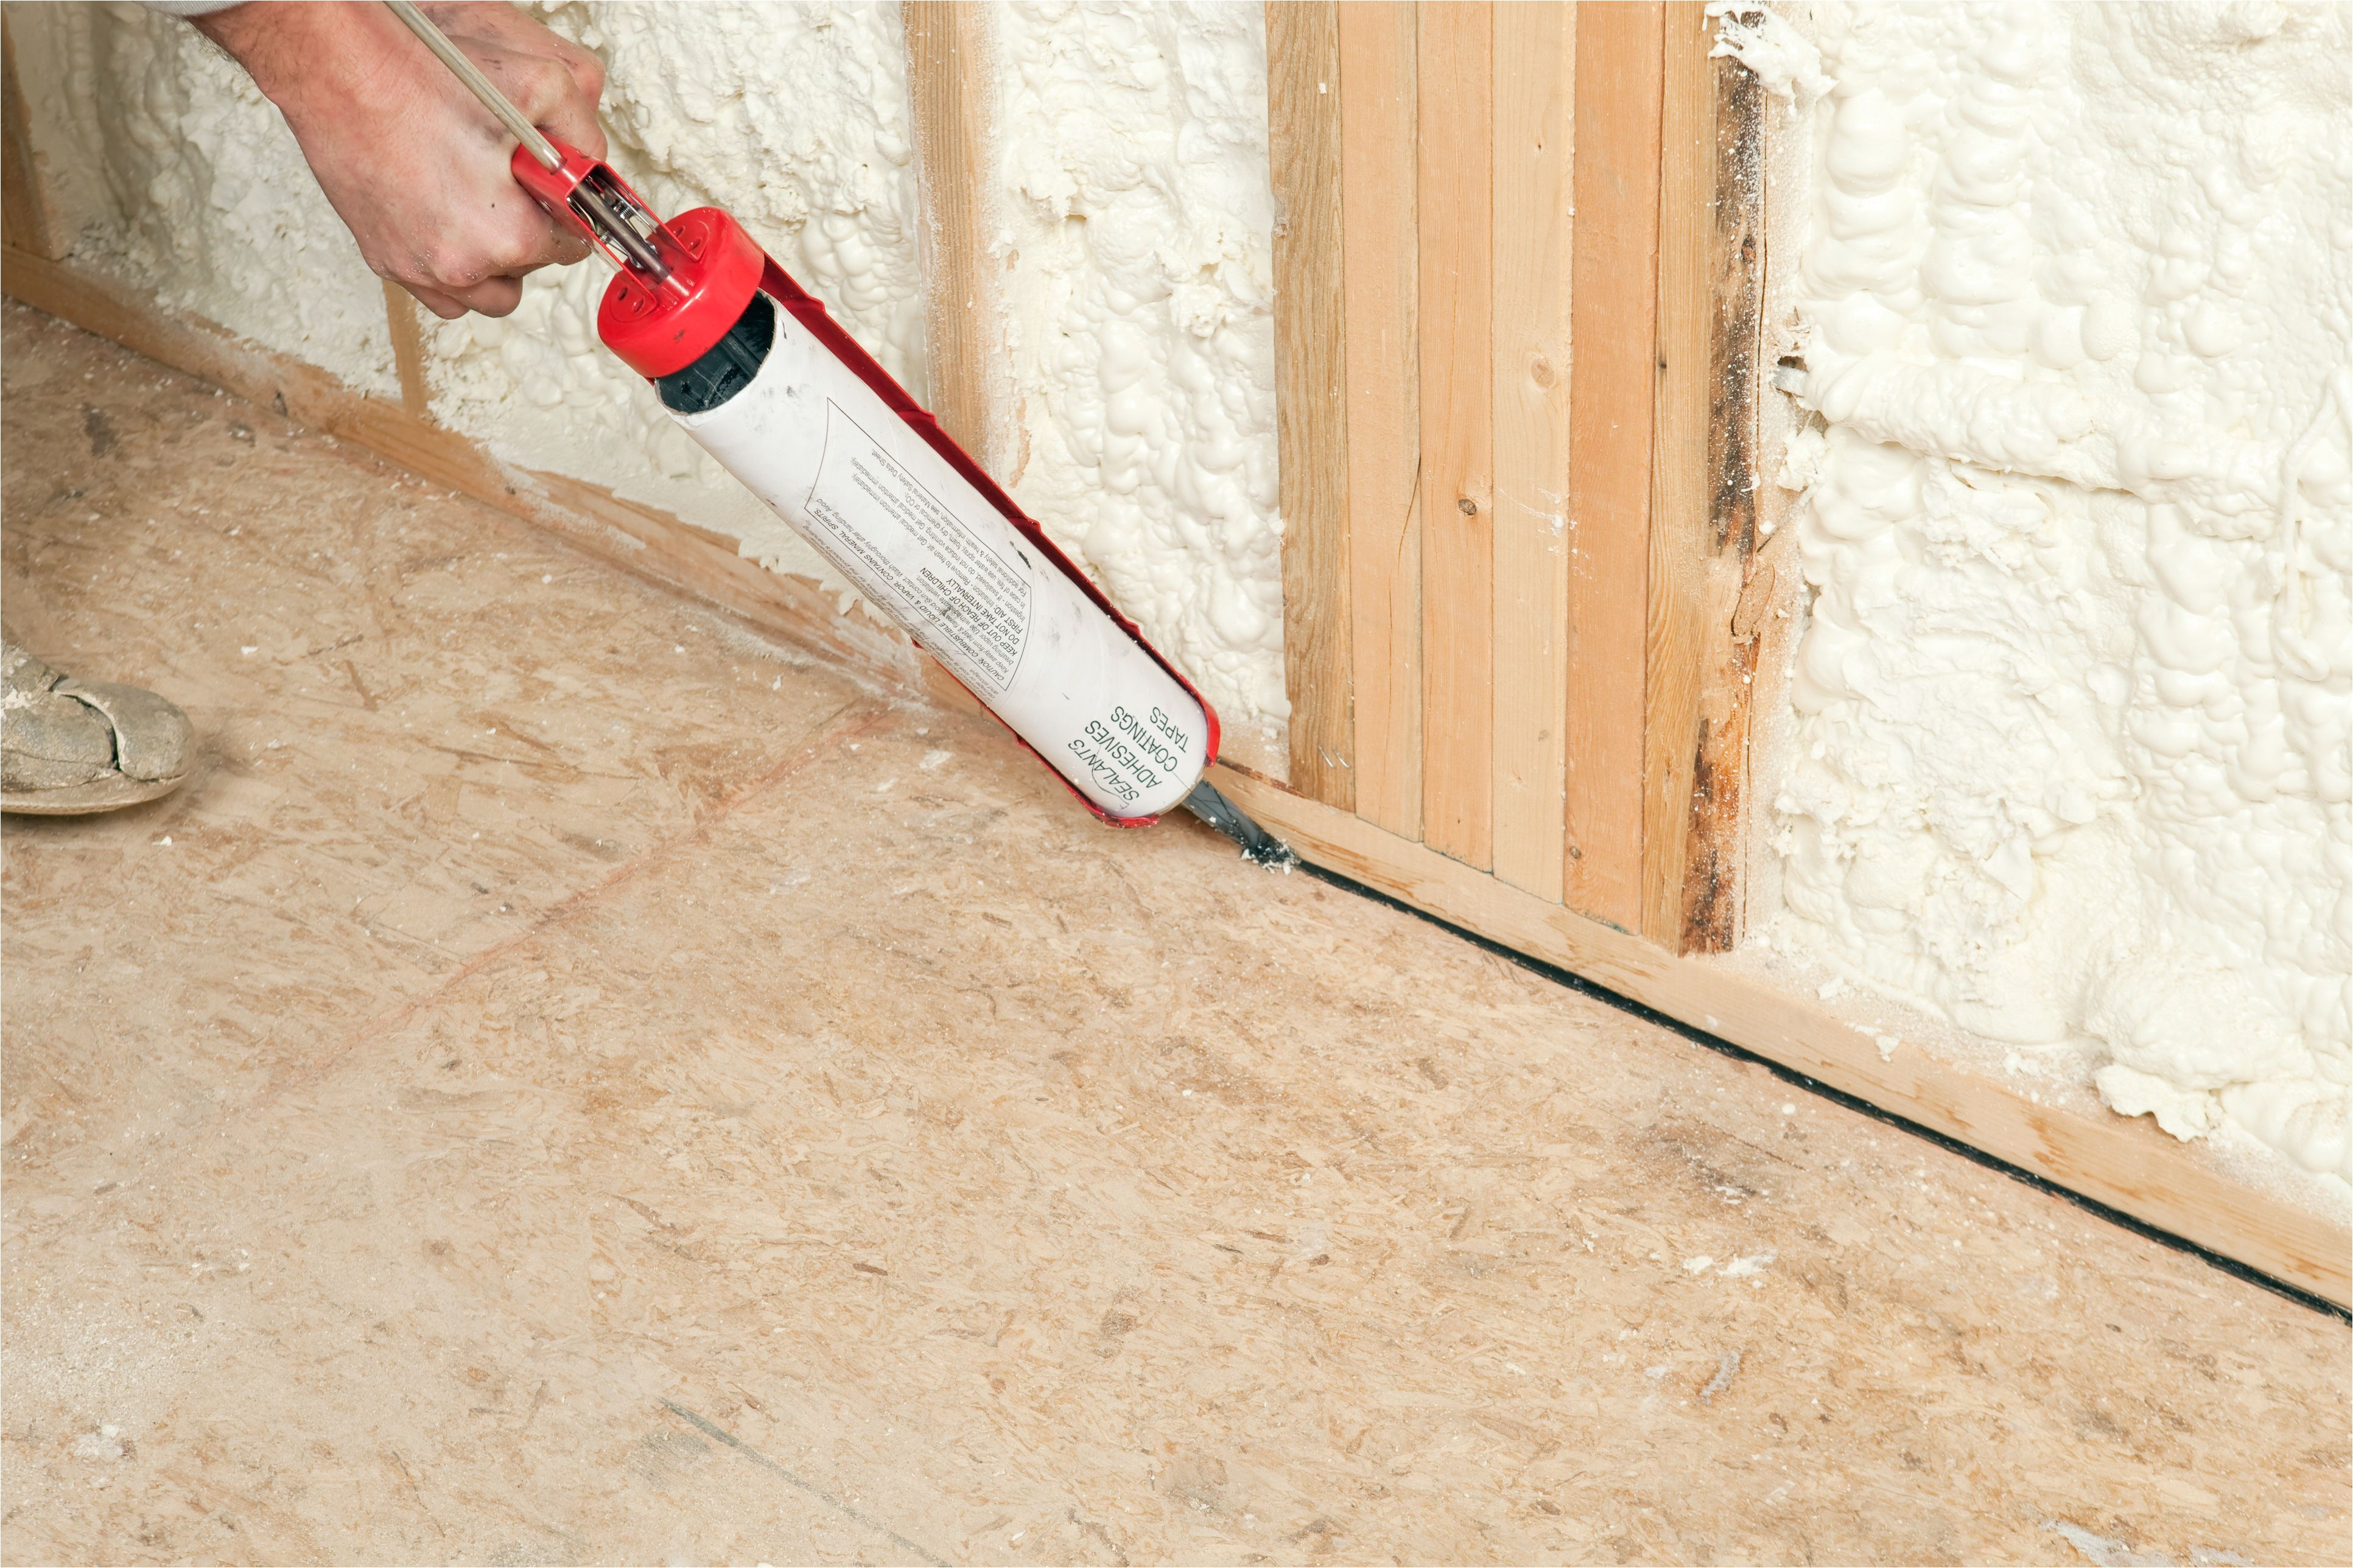 worker caulking wall plate to subfloor 185099682 57fa64803df78c690f7666e2 jpg